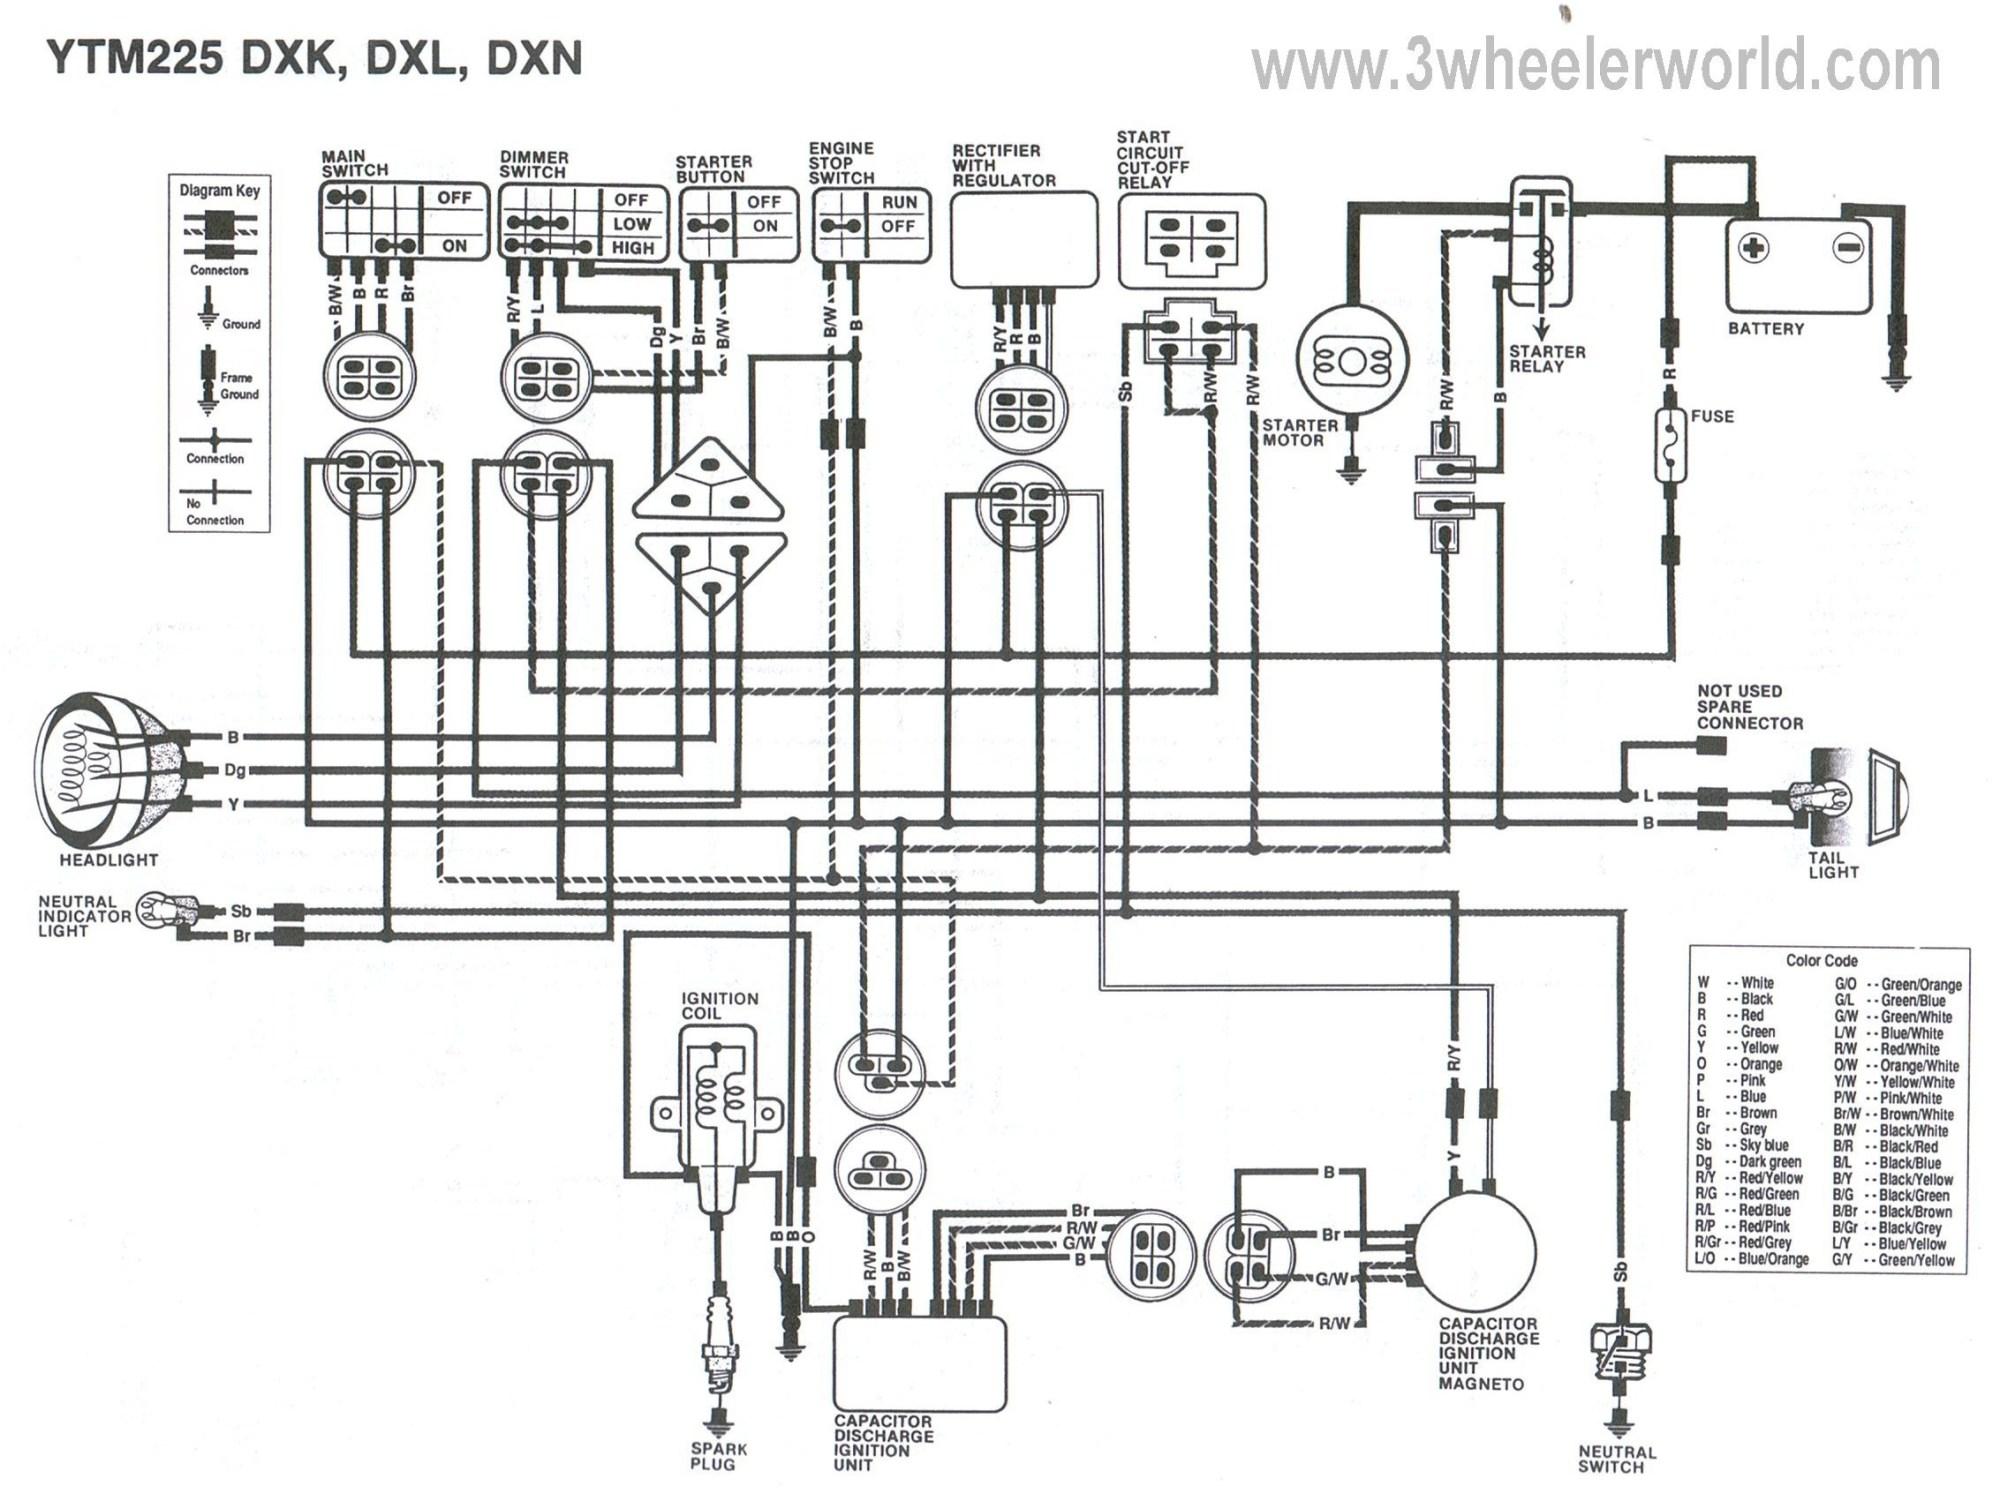 hight resolution of xsvi 6502 nav wiring diagram download motorcycle wiring diagram unique yamaha timberwolf 20 11